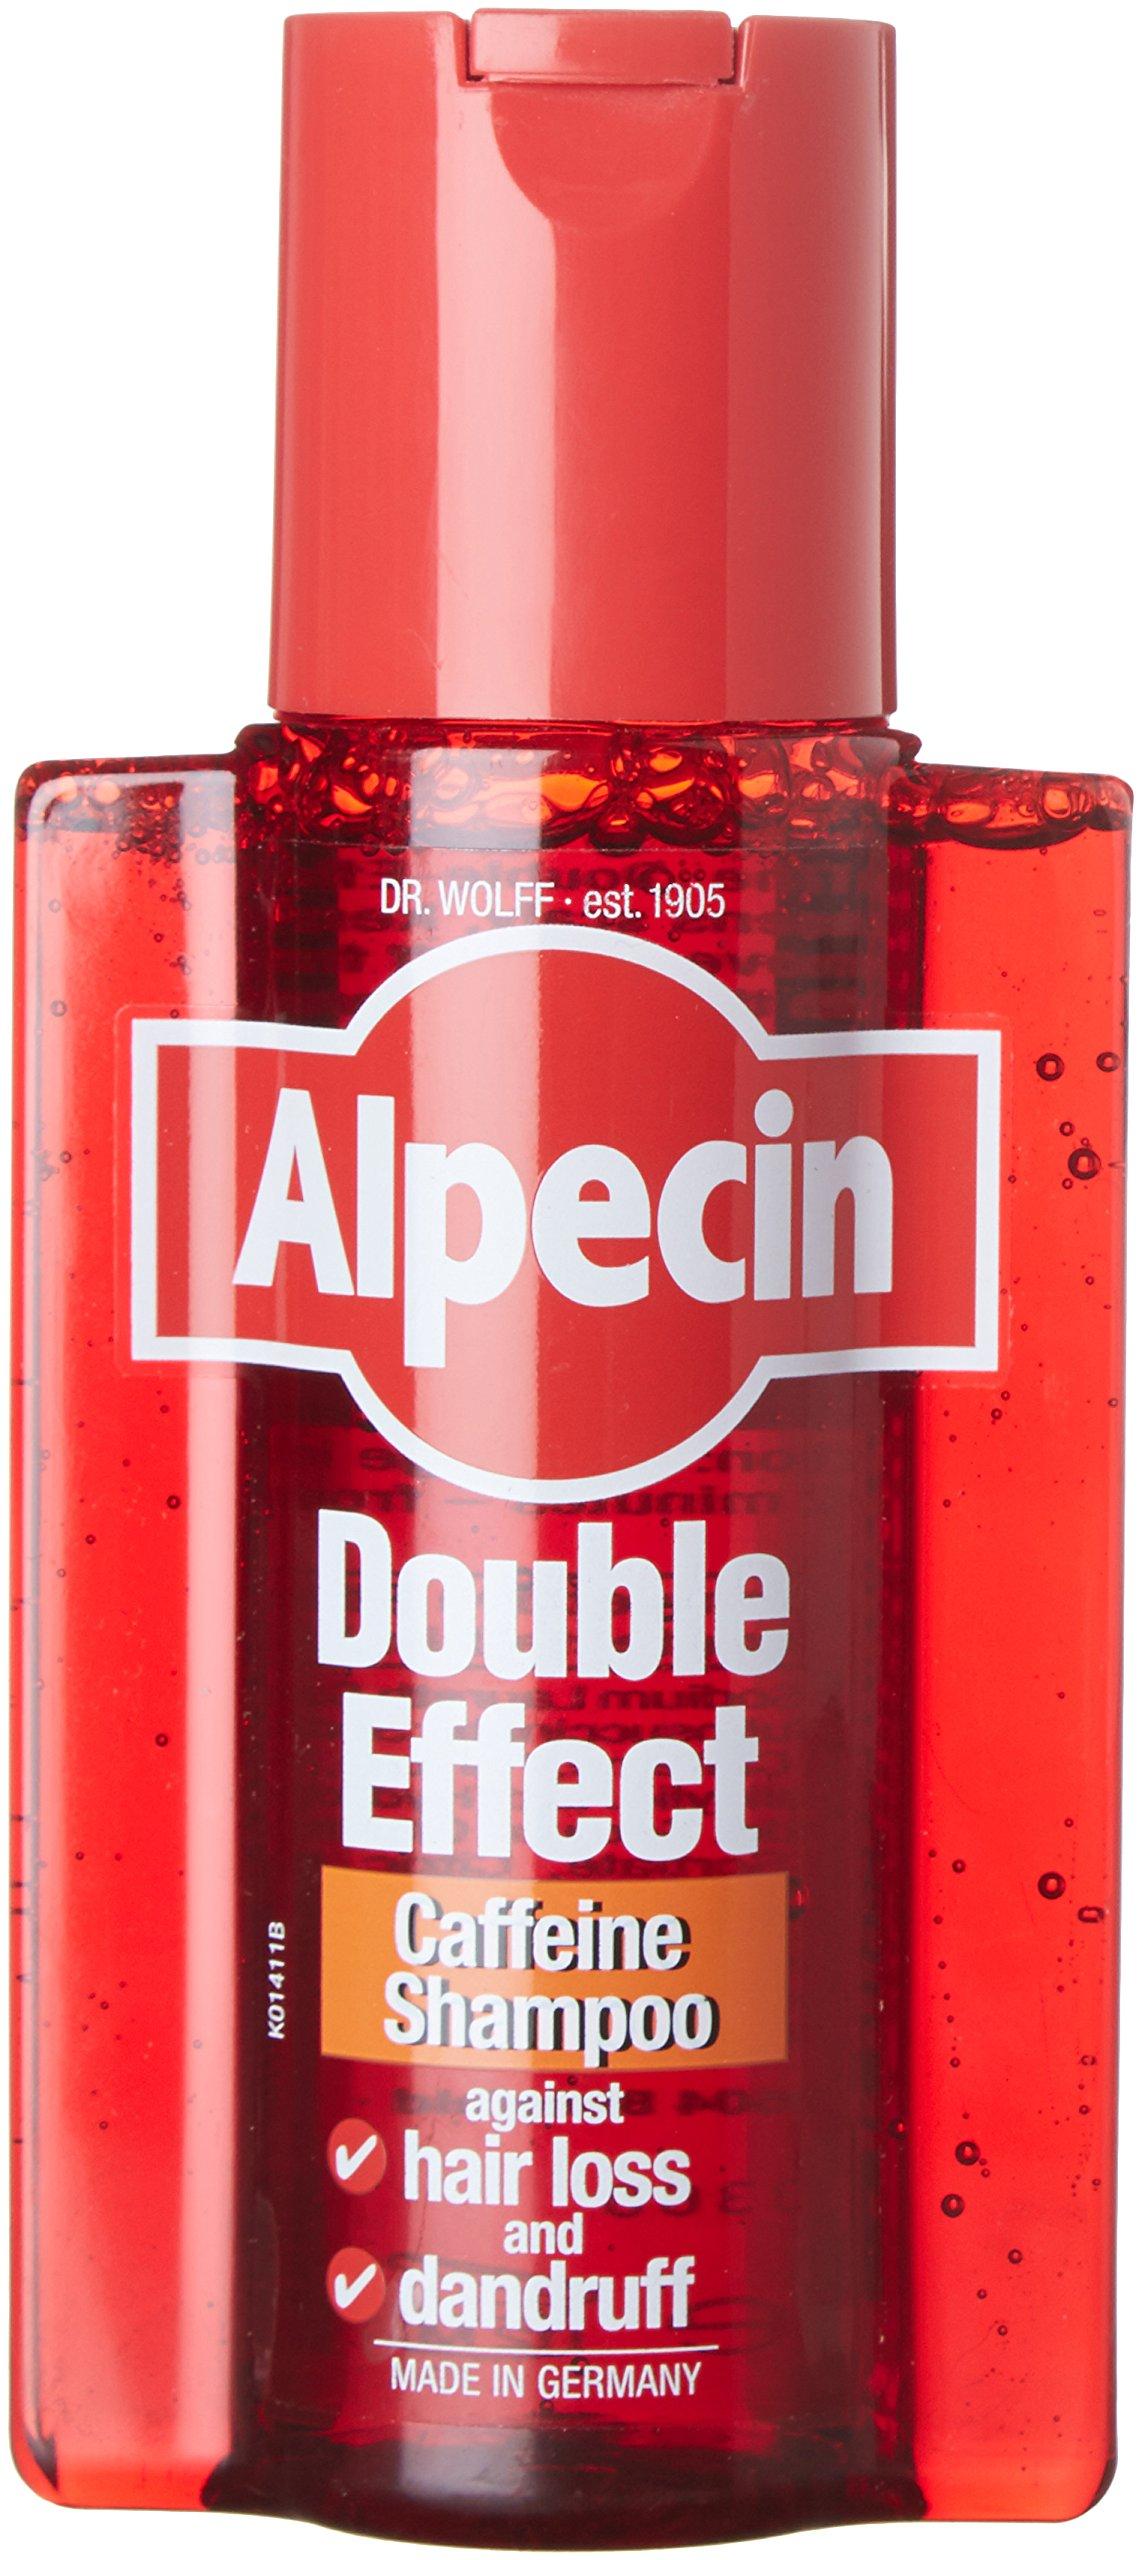 Alpecin Double Effect Dandruff and Hair Loss Shampoo 200 ml